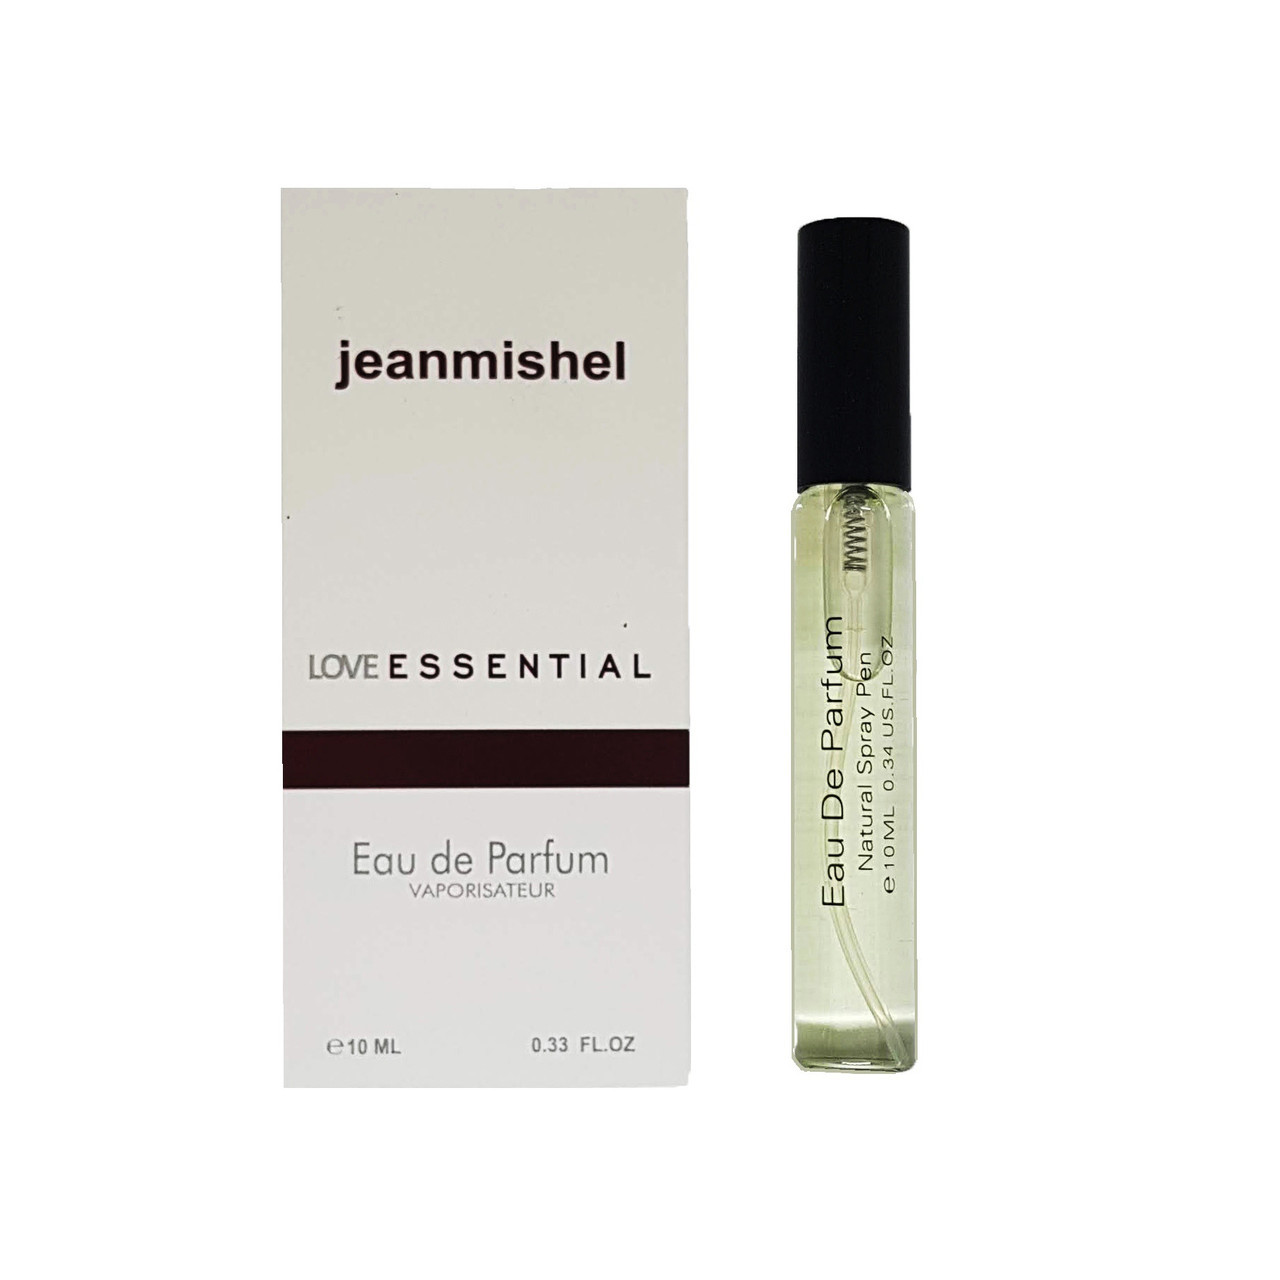 Jeanmishel Love Essential pour femme (103) 10ml